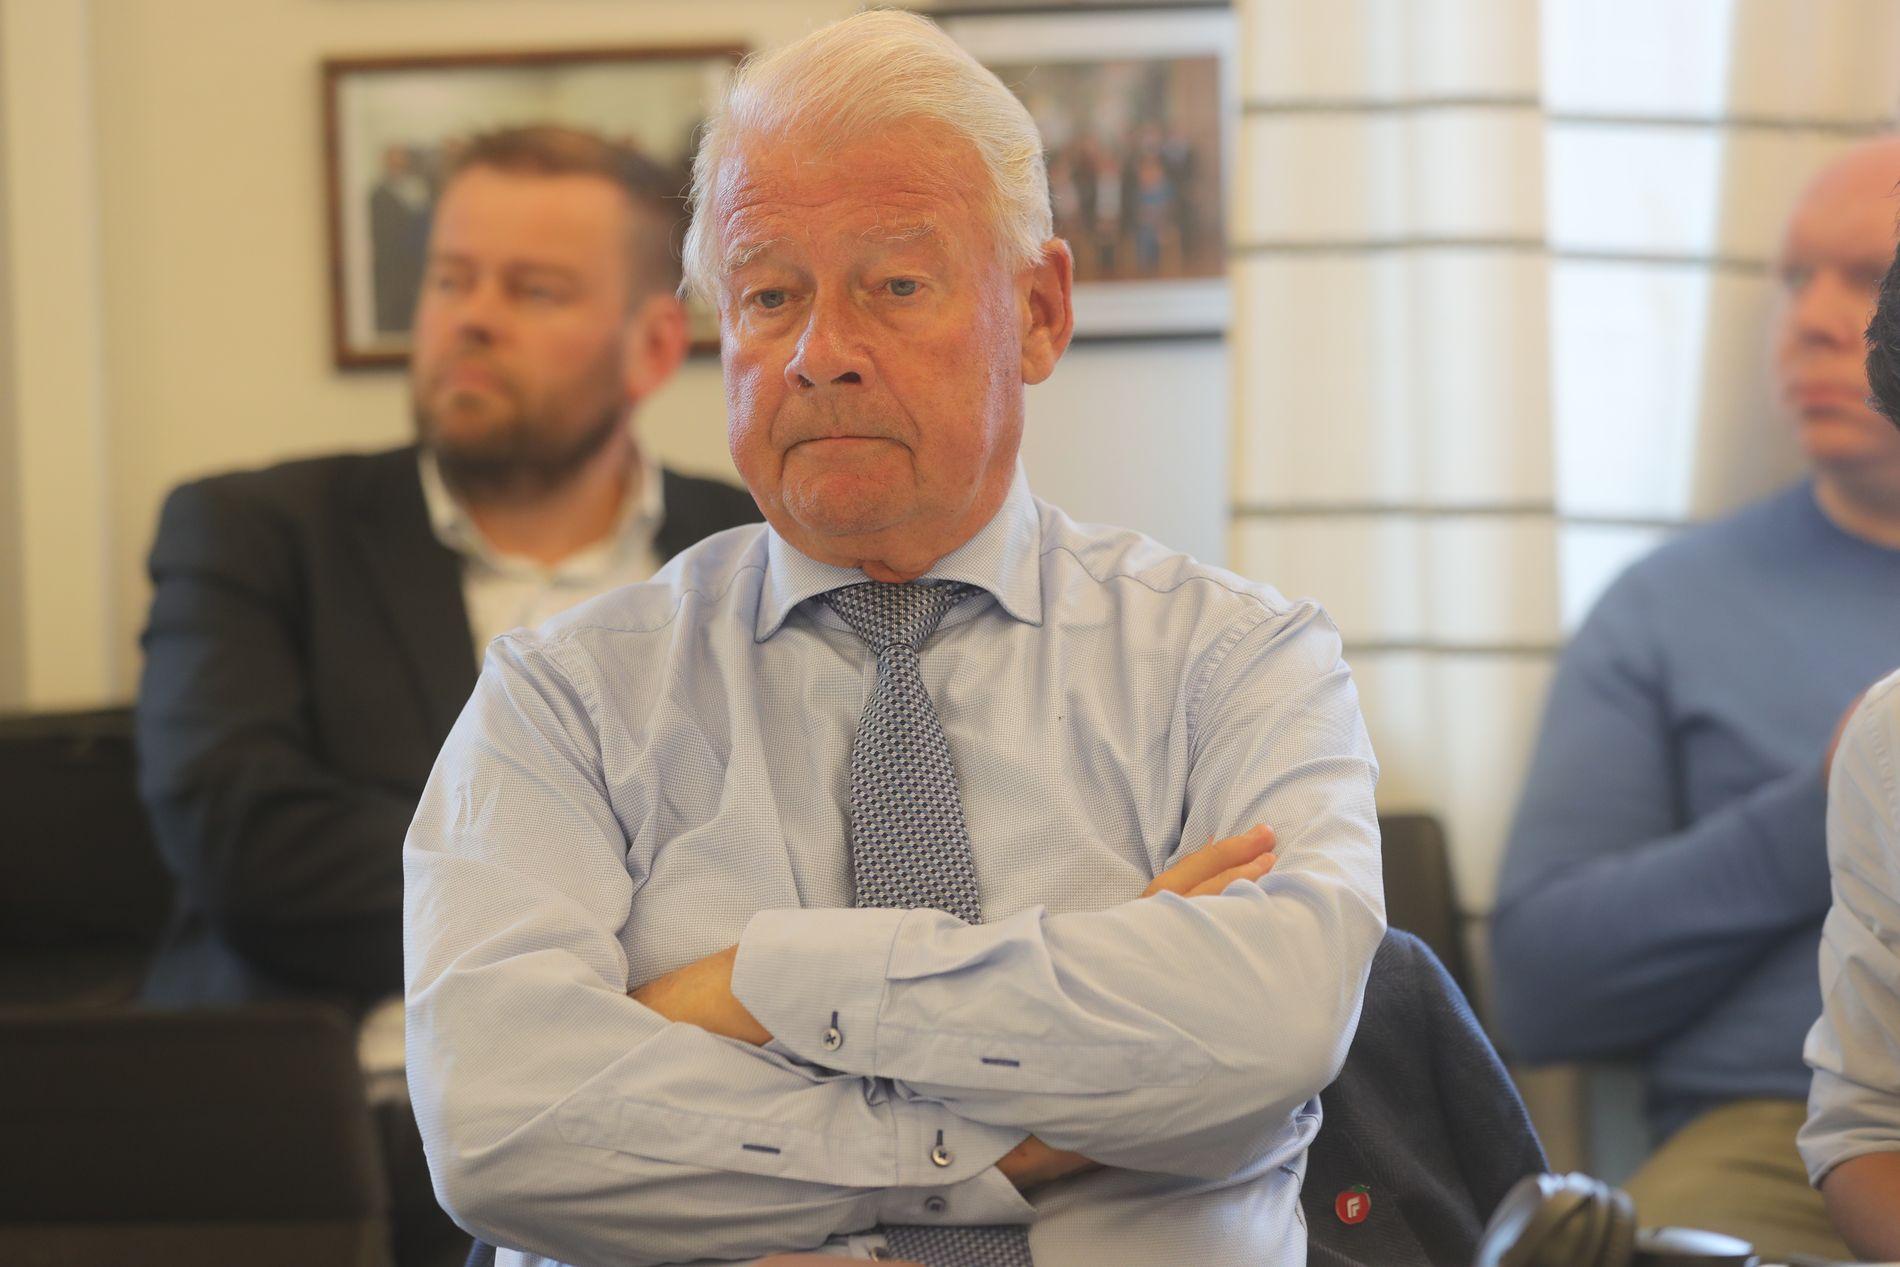 UENIG: Frp-profil Carl I. Hagen vil ikke stemme for handlingsprogrammet for Oslopakke 3.